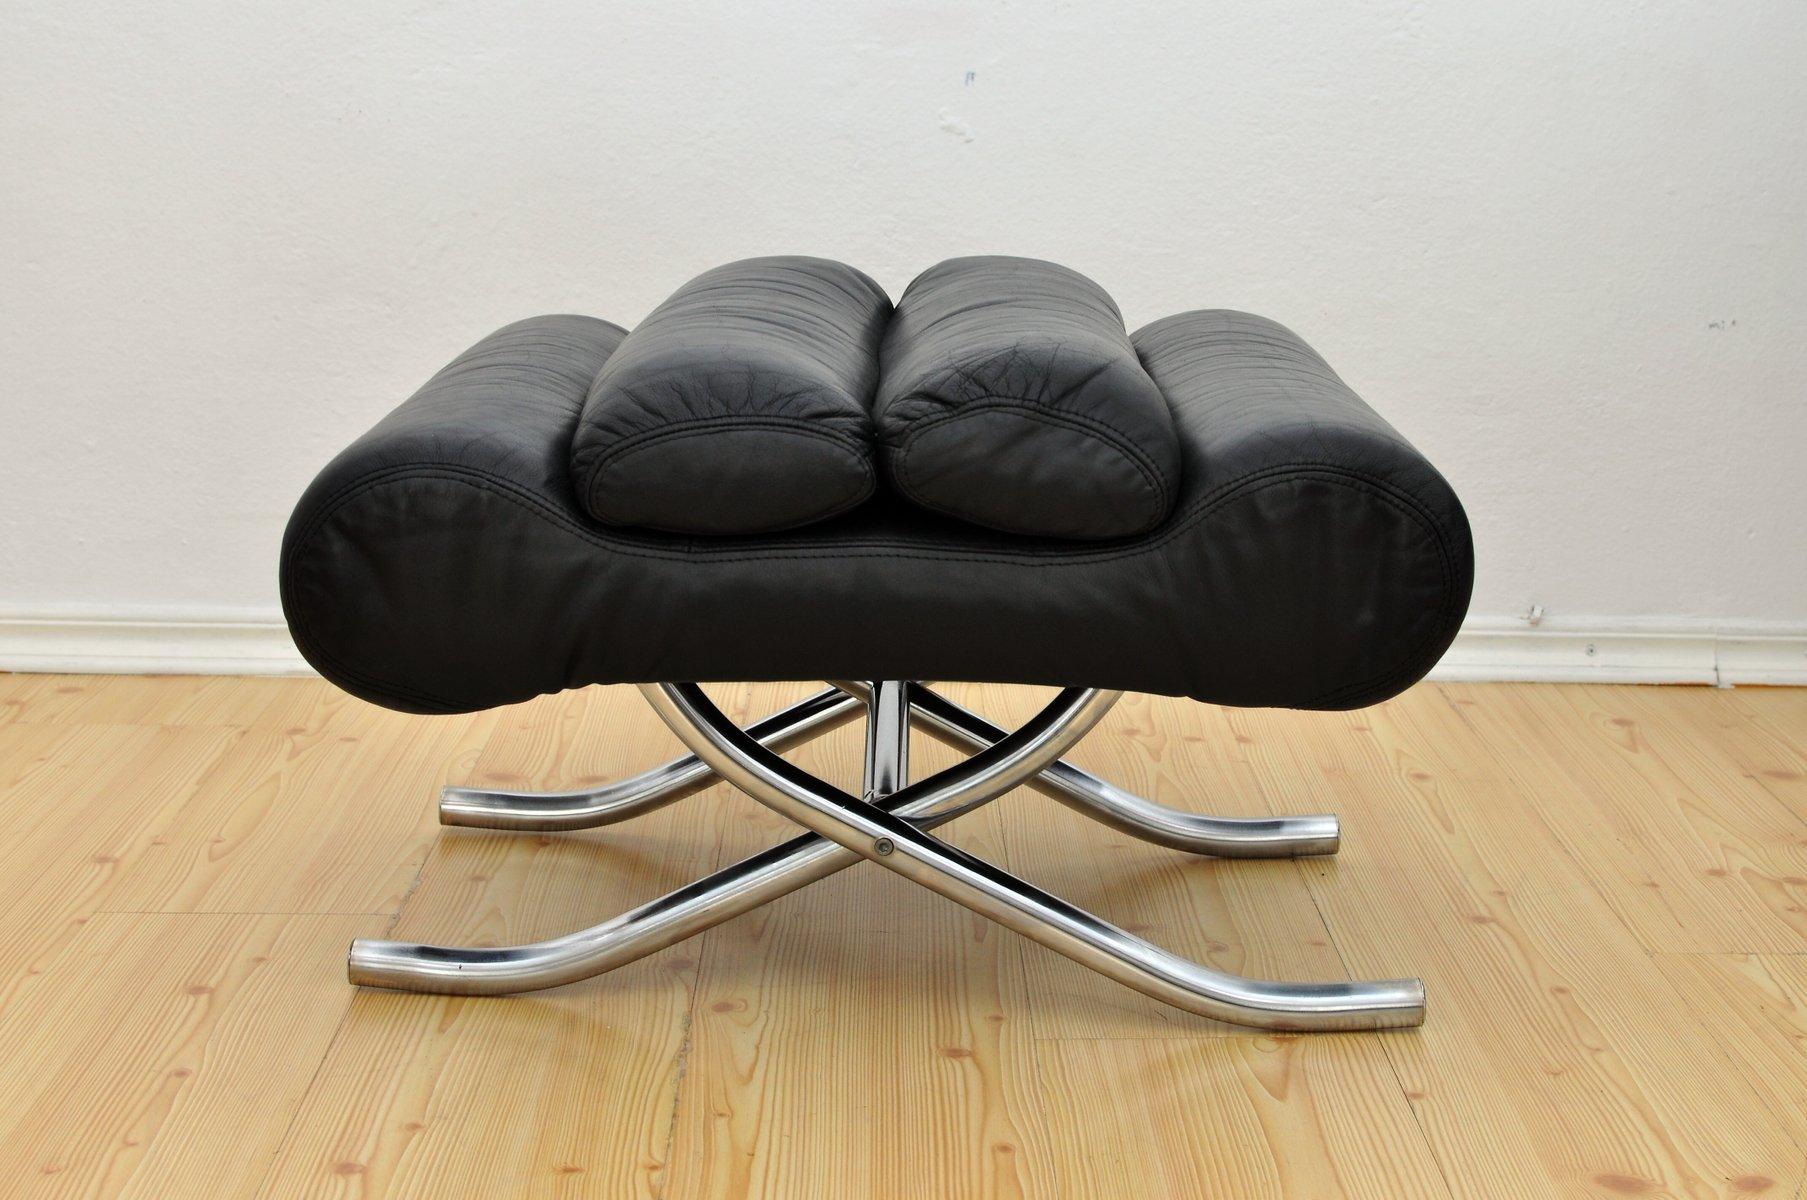 Moderno Silla Reclinable Muebles Otomana Viñeta - Muebles Para Ideas ...